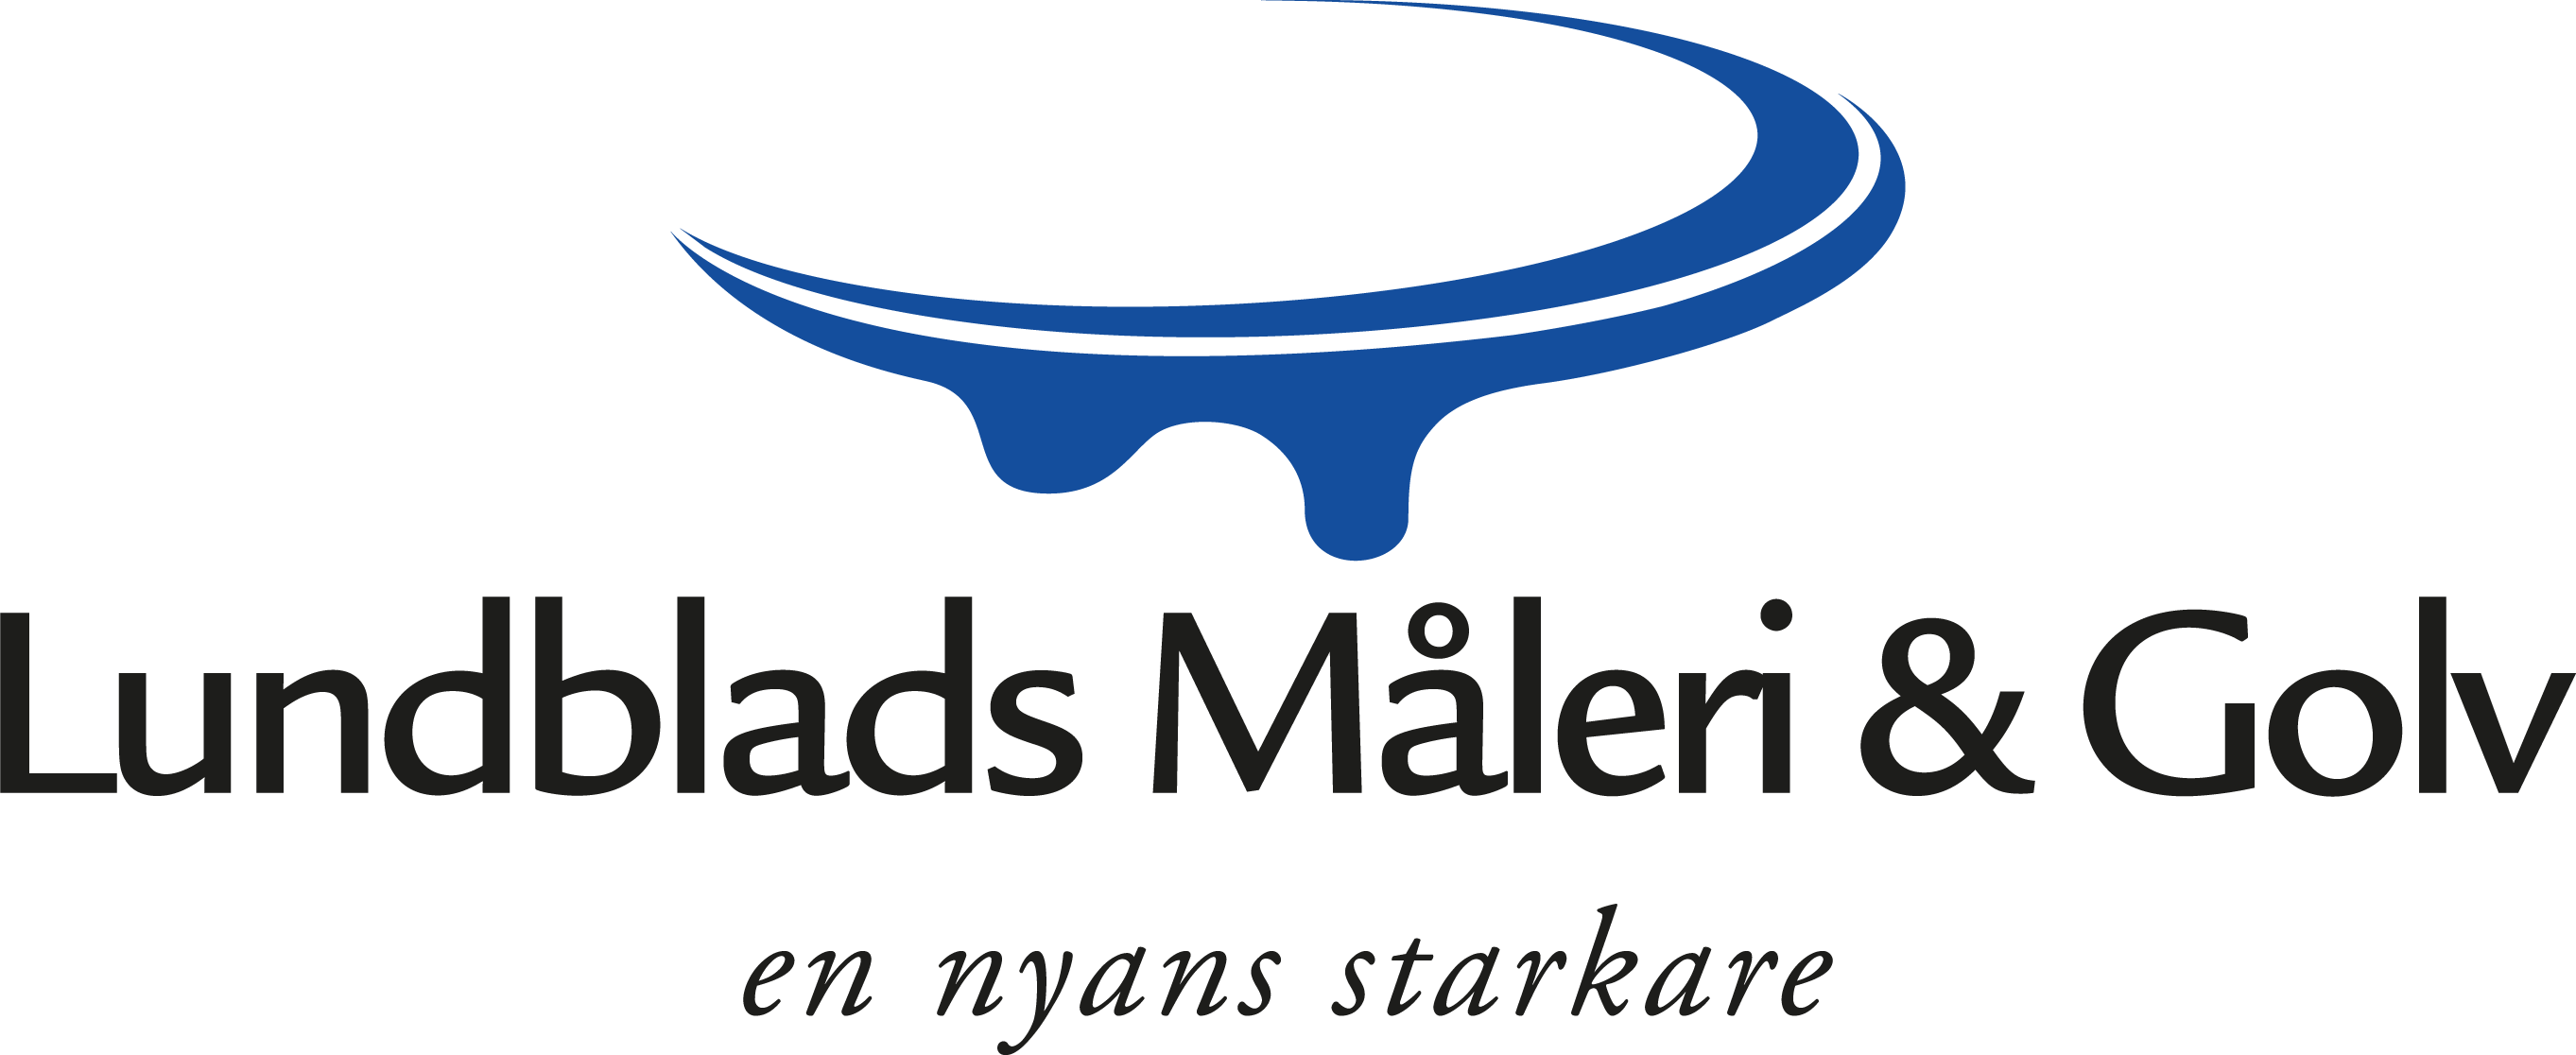 LUNDBLADS-Måleri-&-Golv